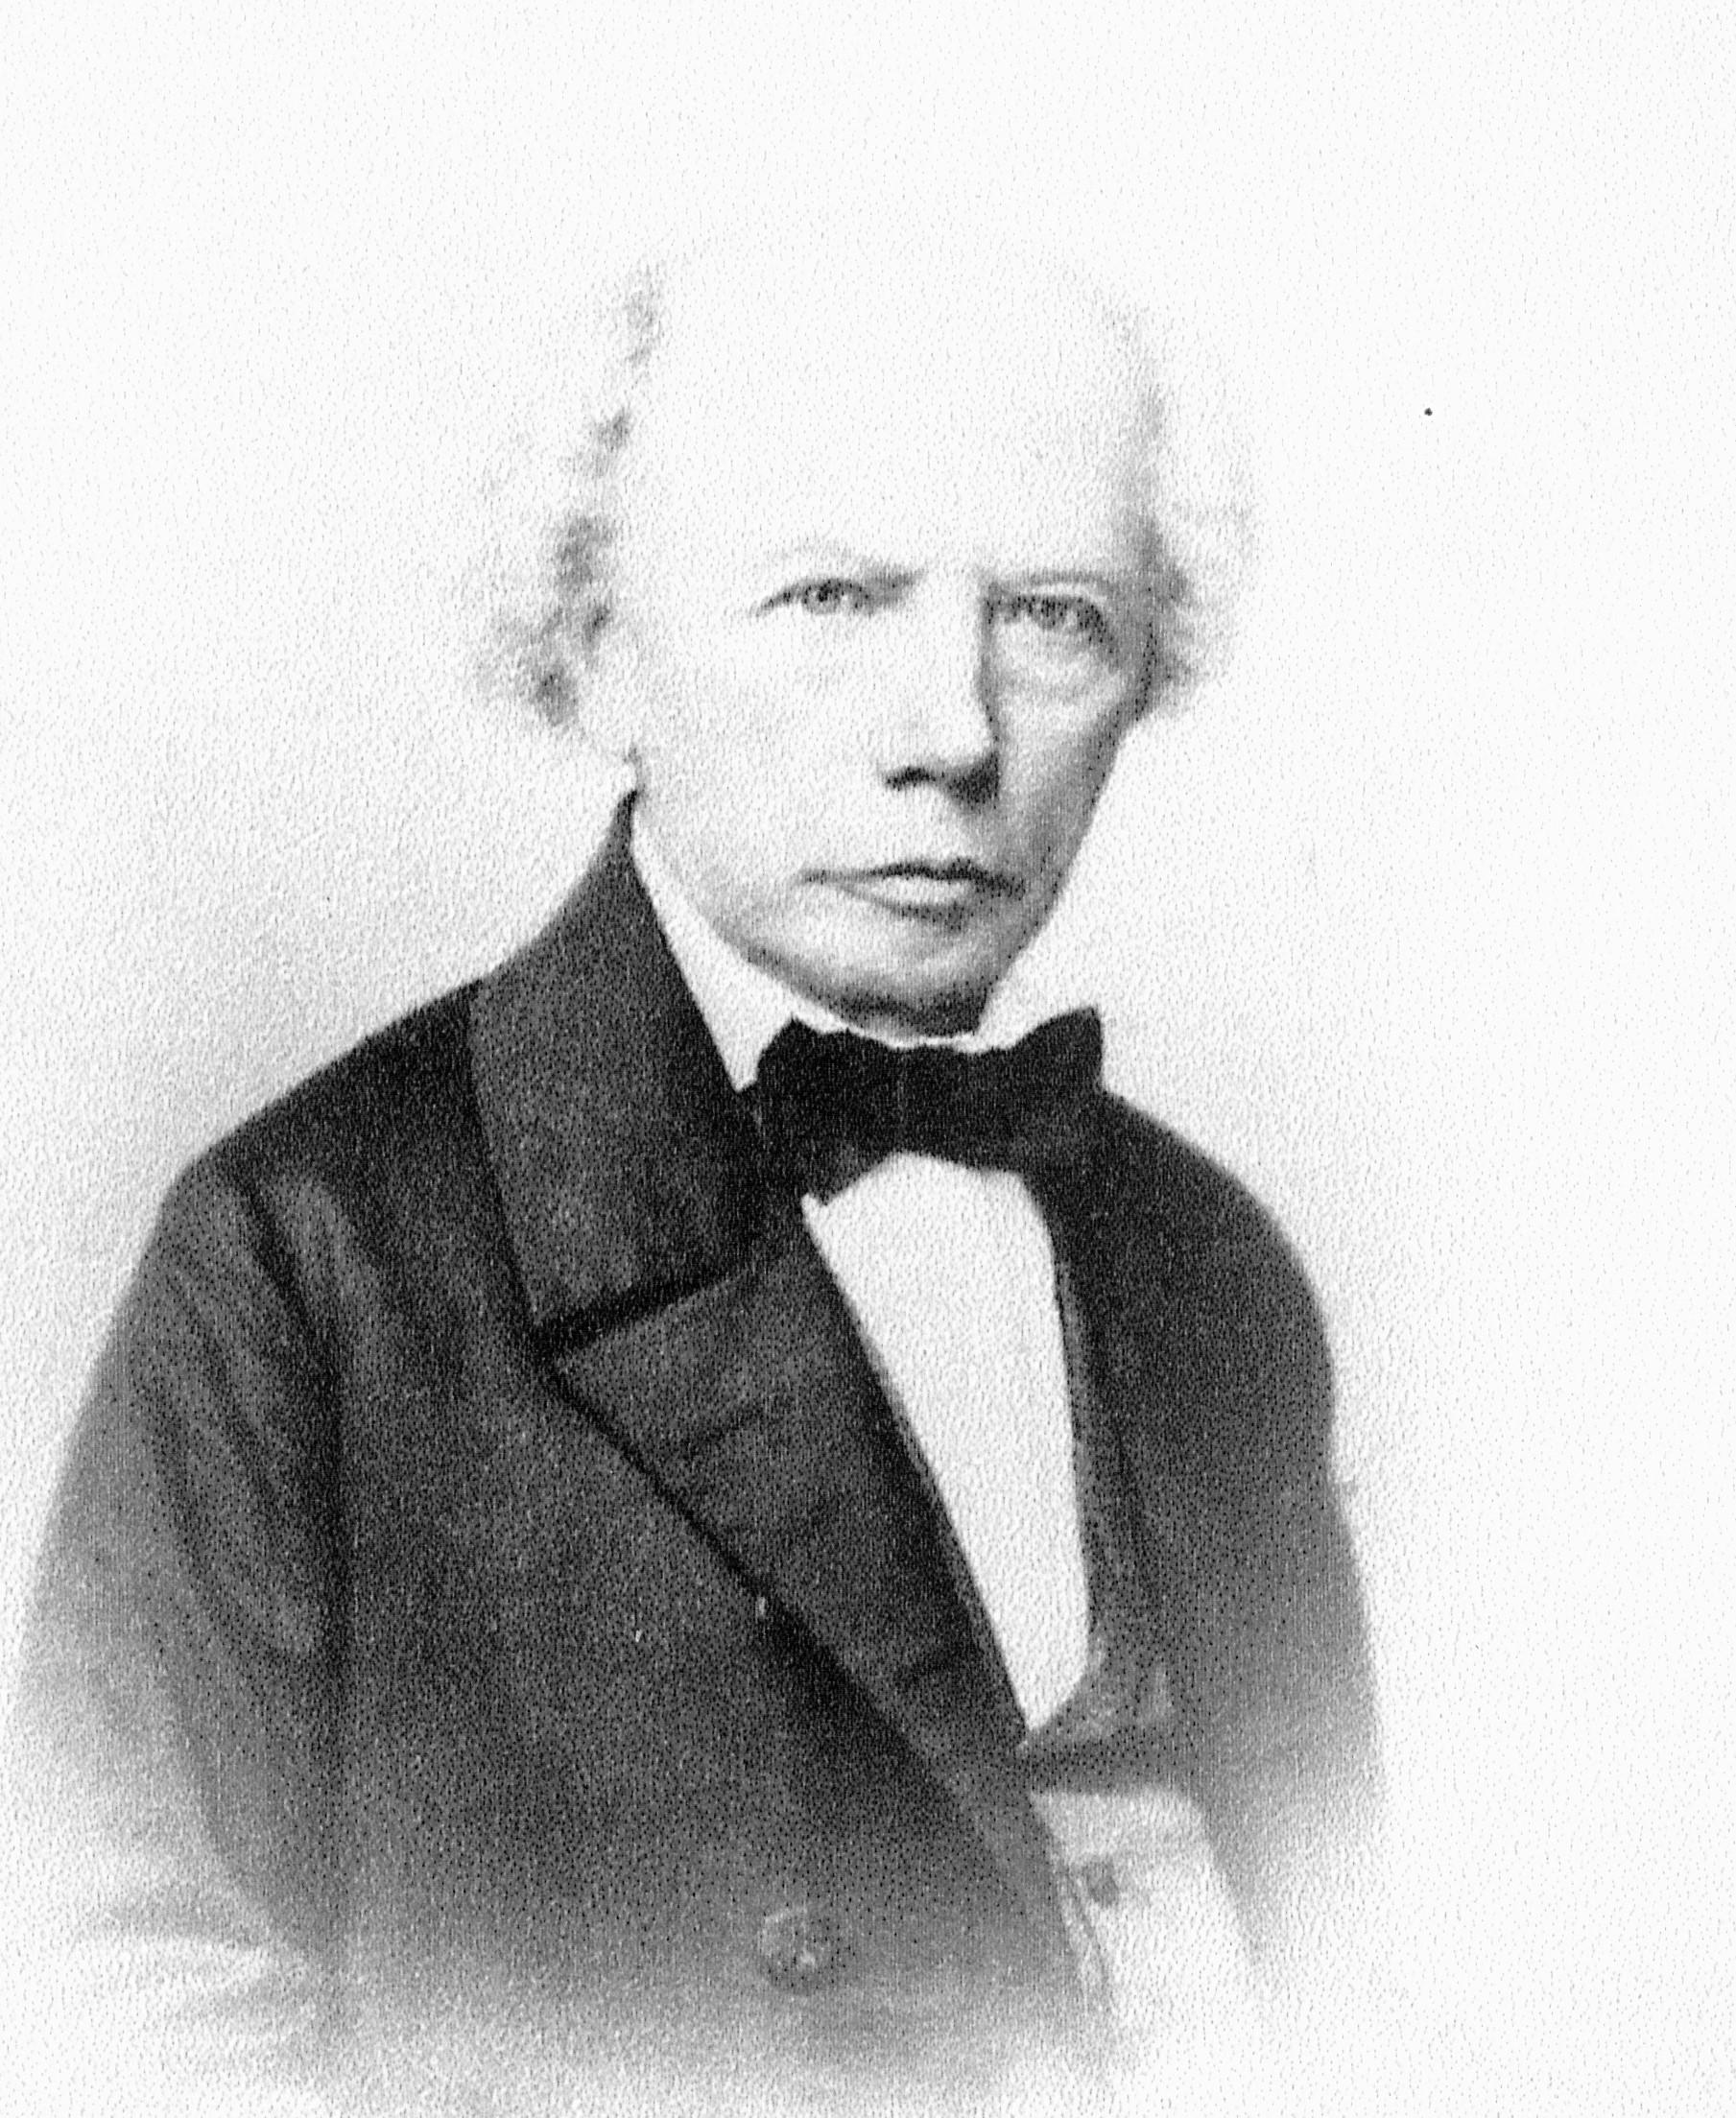 Machuel Levi